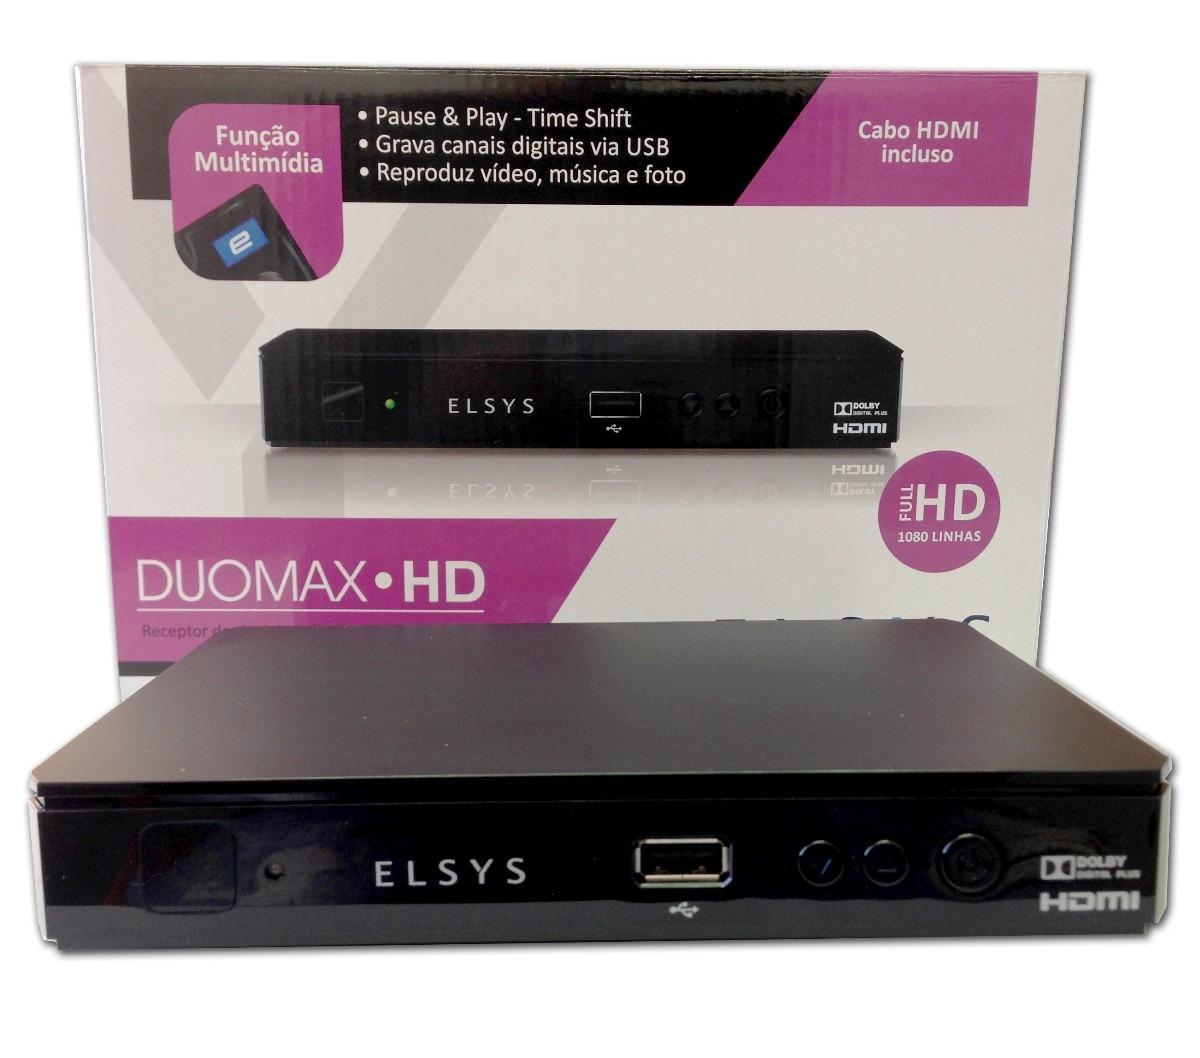 Receptor Elsys Duomax Analógico, Digital HD